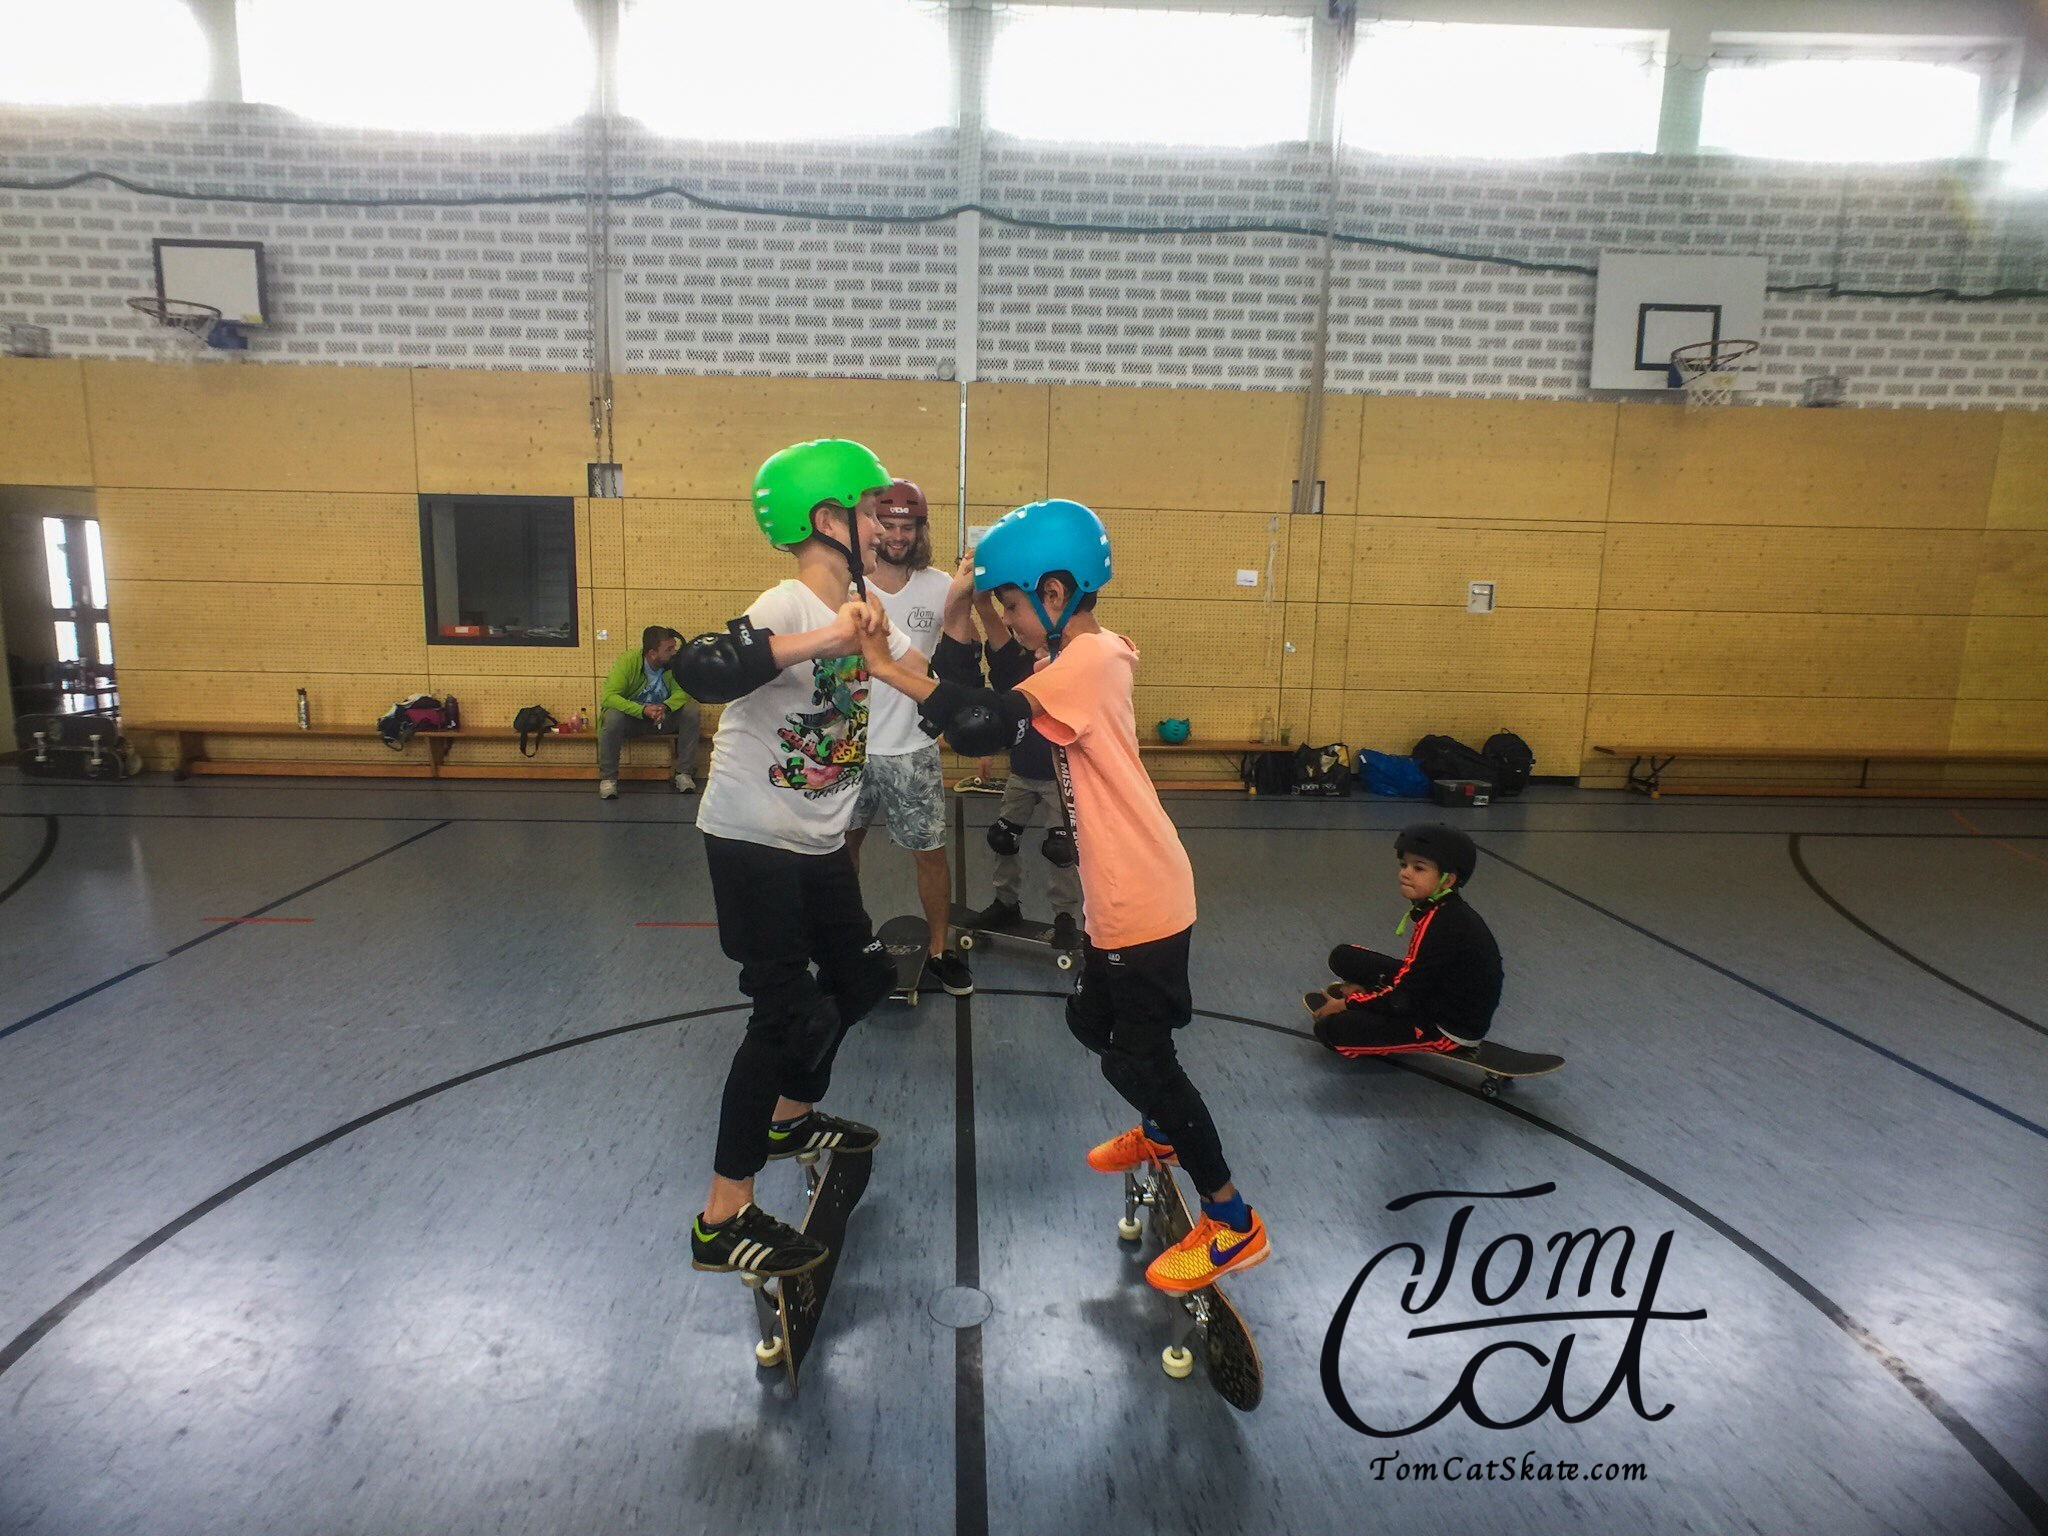 Skatkurs Erpfting Landsberg am Lech Tom Cat Skate Kurse 3 .JPG